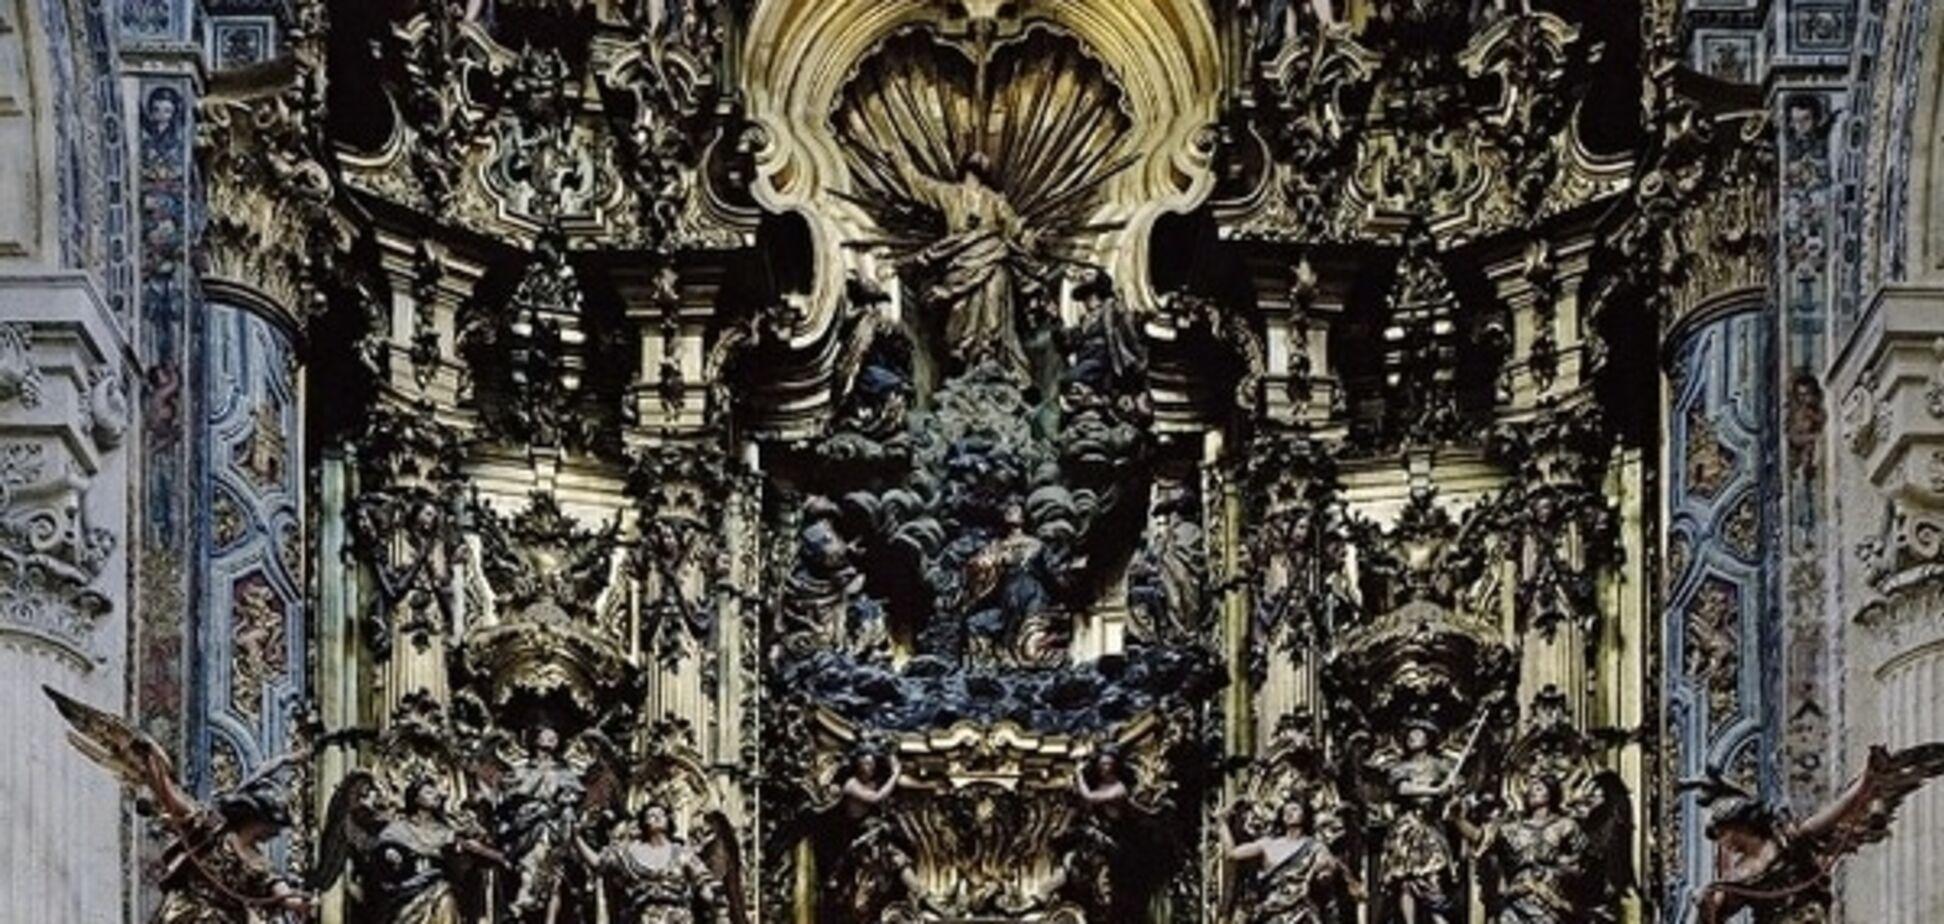 Впечатляющая мощь барочных церквей